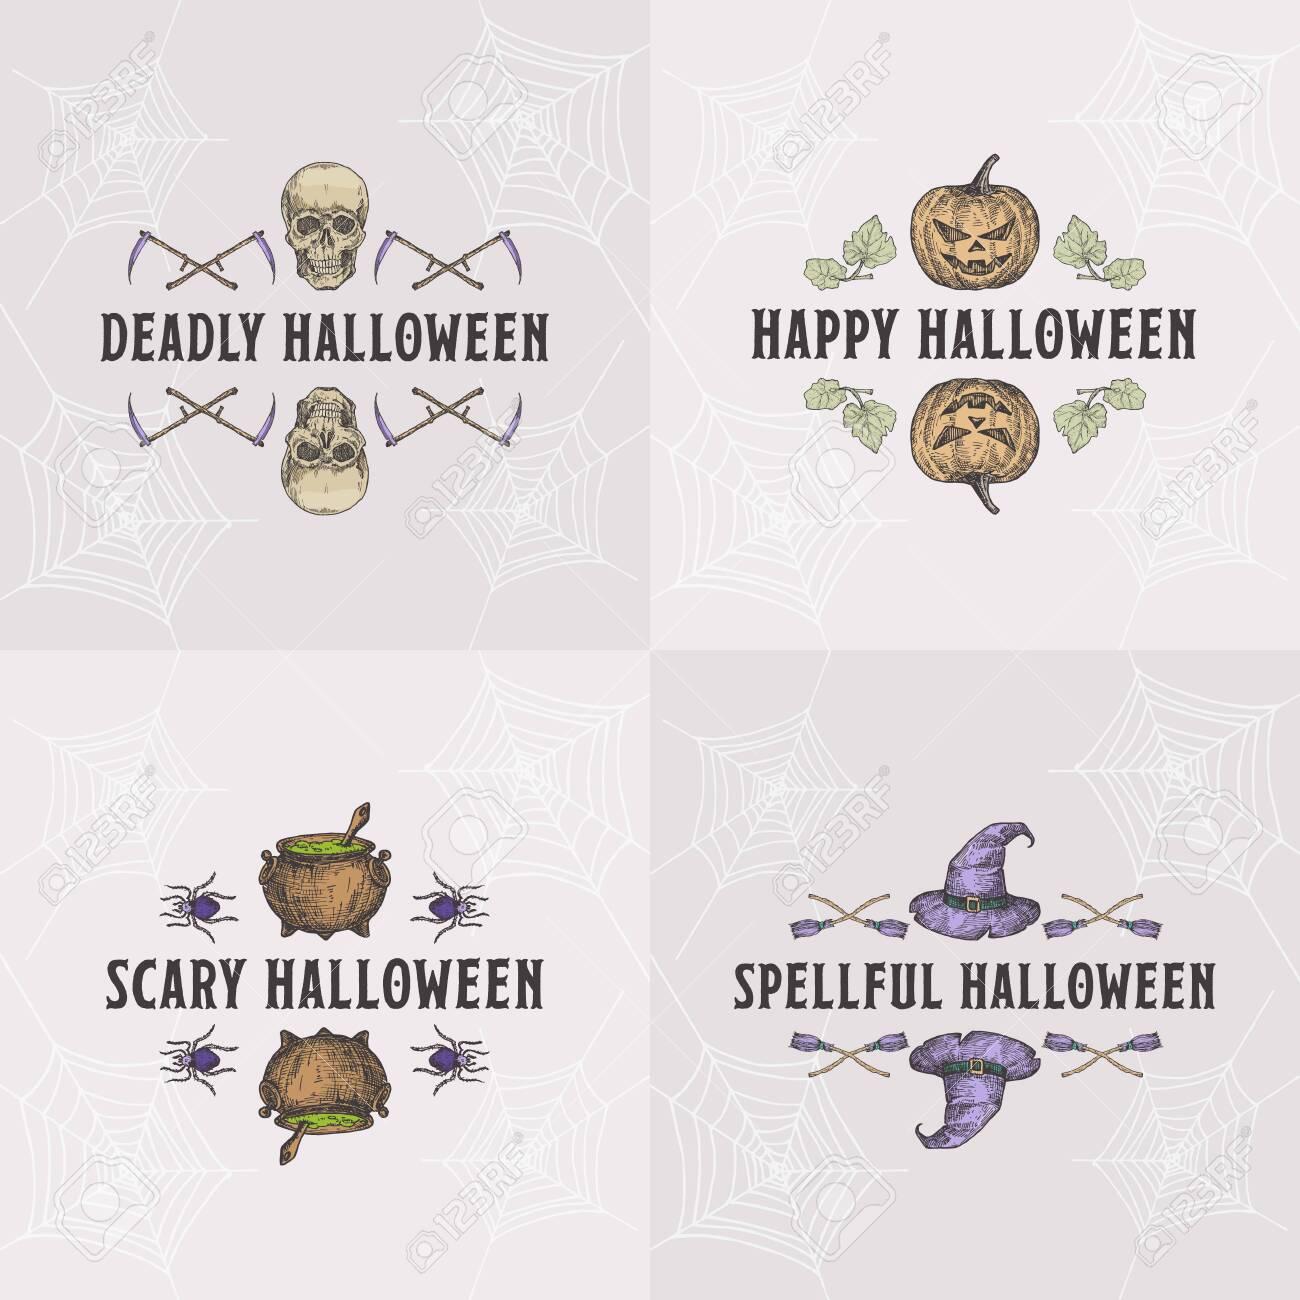 Vintage Style Halloween Headline or Title Greetings Labels Template